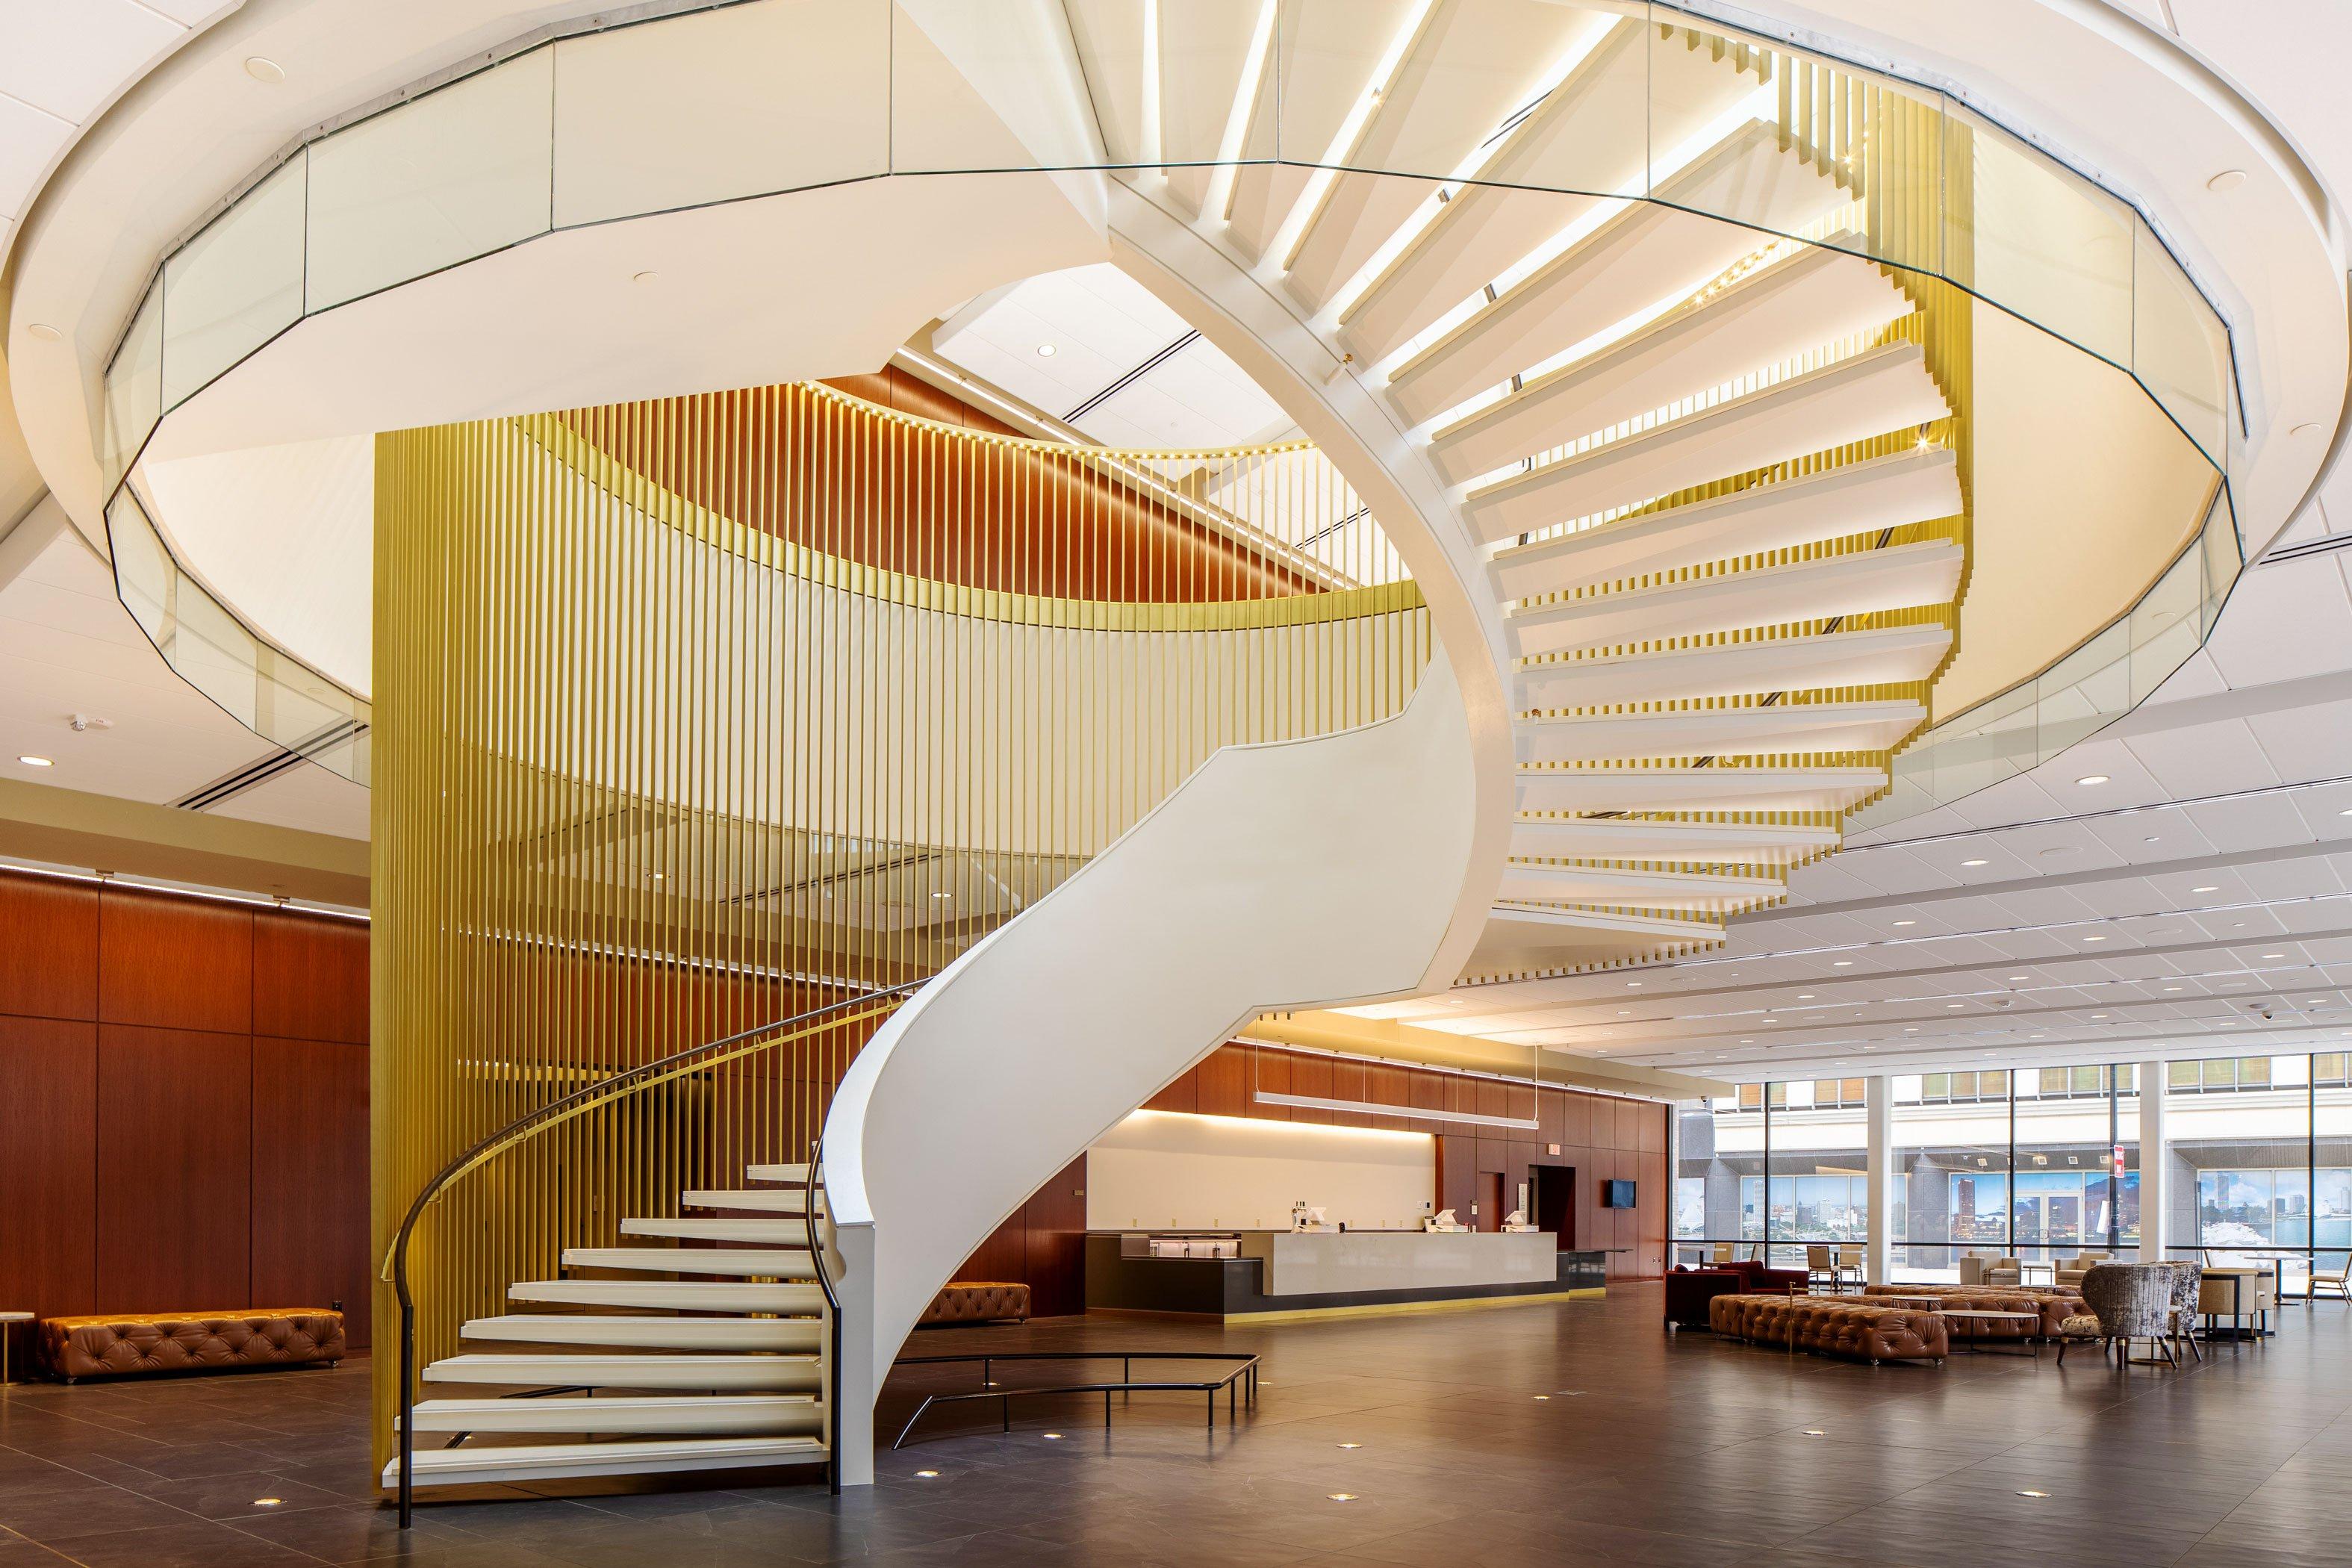 Bradley Symphony Center spiral staircase modern atrium architecture of Milwaukee Symphony Orchestra